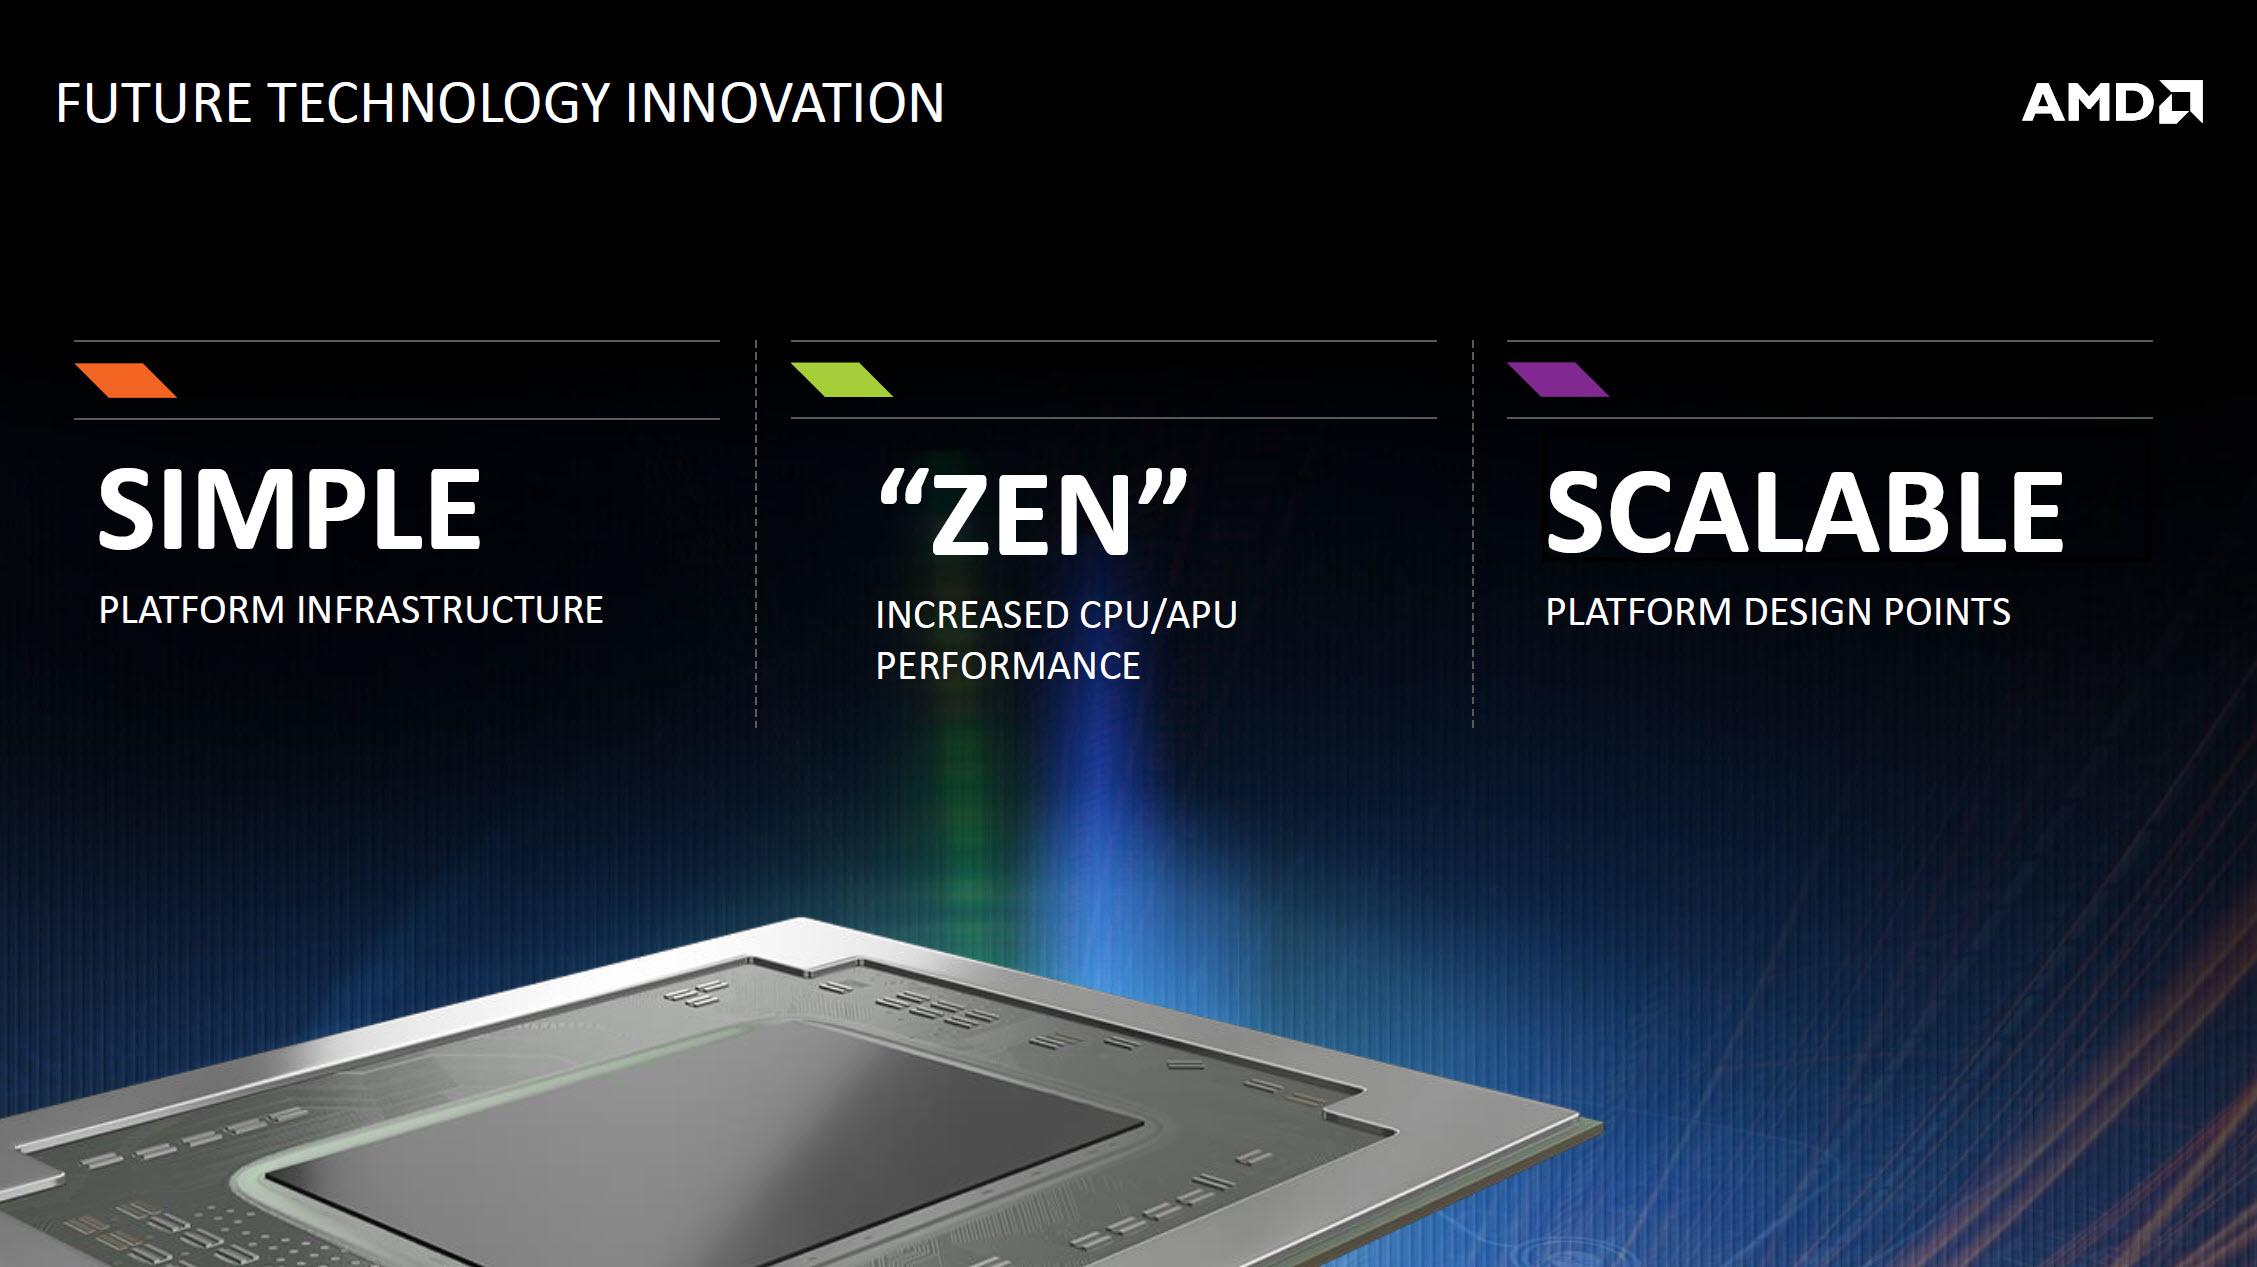 AMD Simpe Zen Scalable